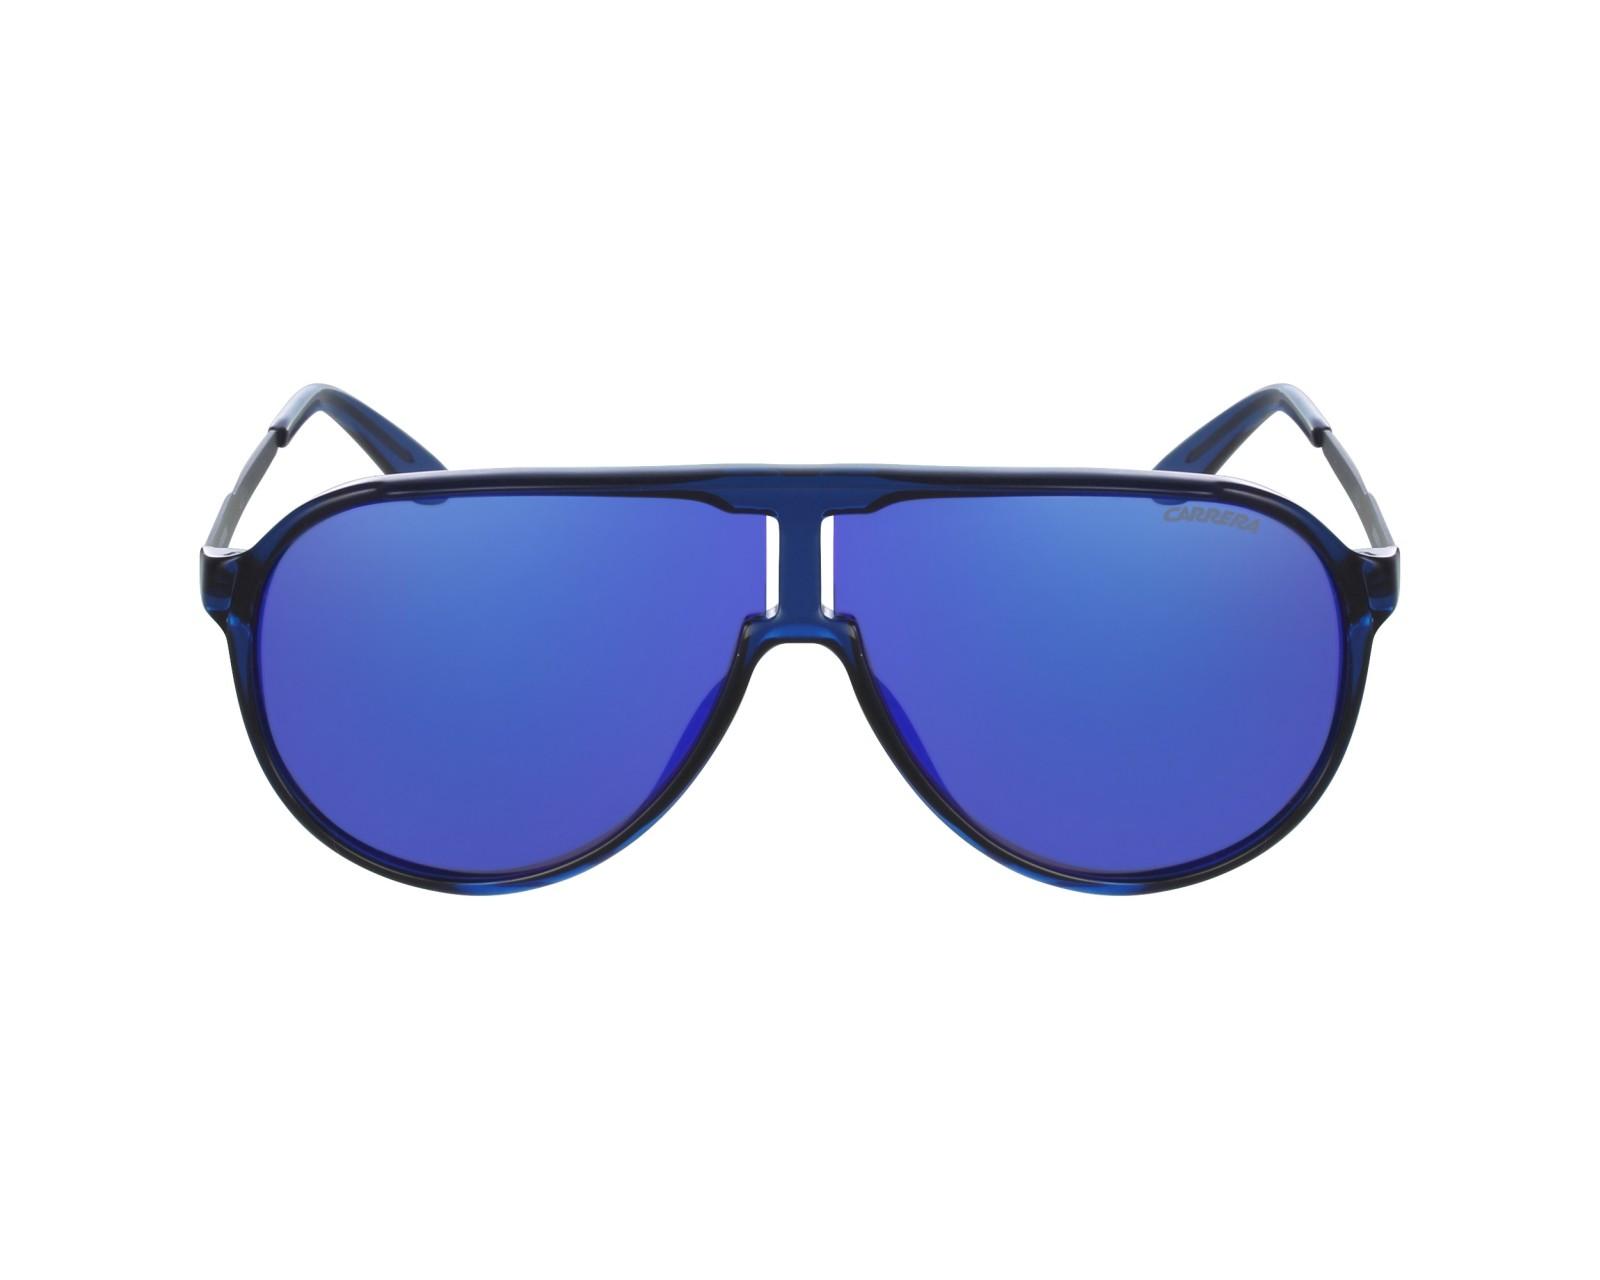 36462d80db6bec Sunglasses Carrera New-Champion 8FS Z0 - Blue Stone profile view